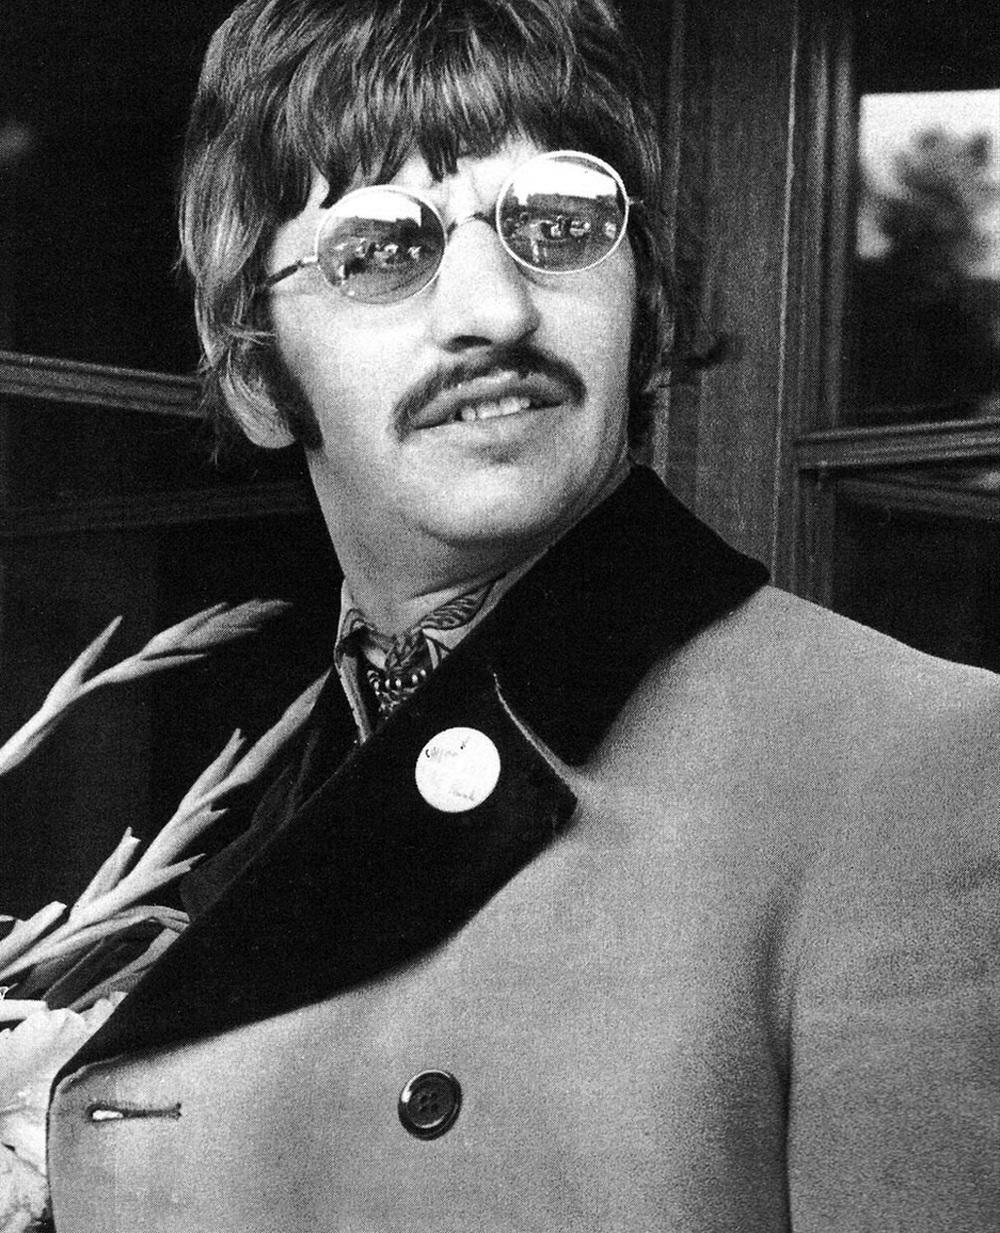 Ringo Starr, 1967.